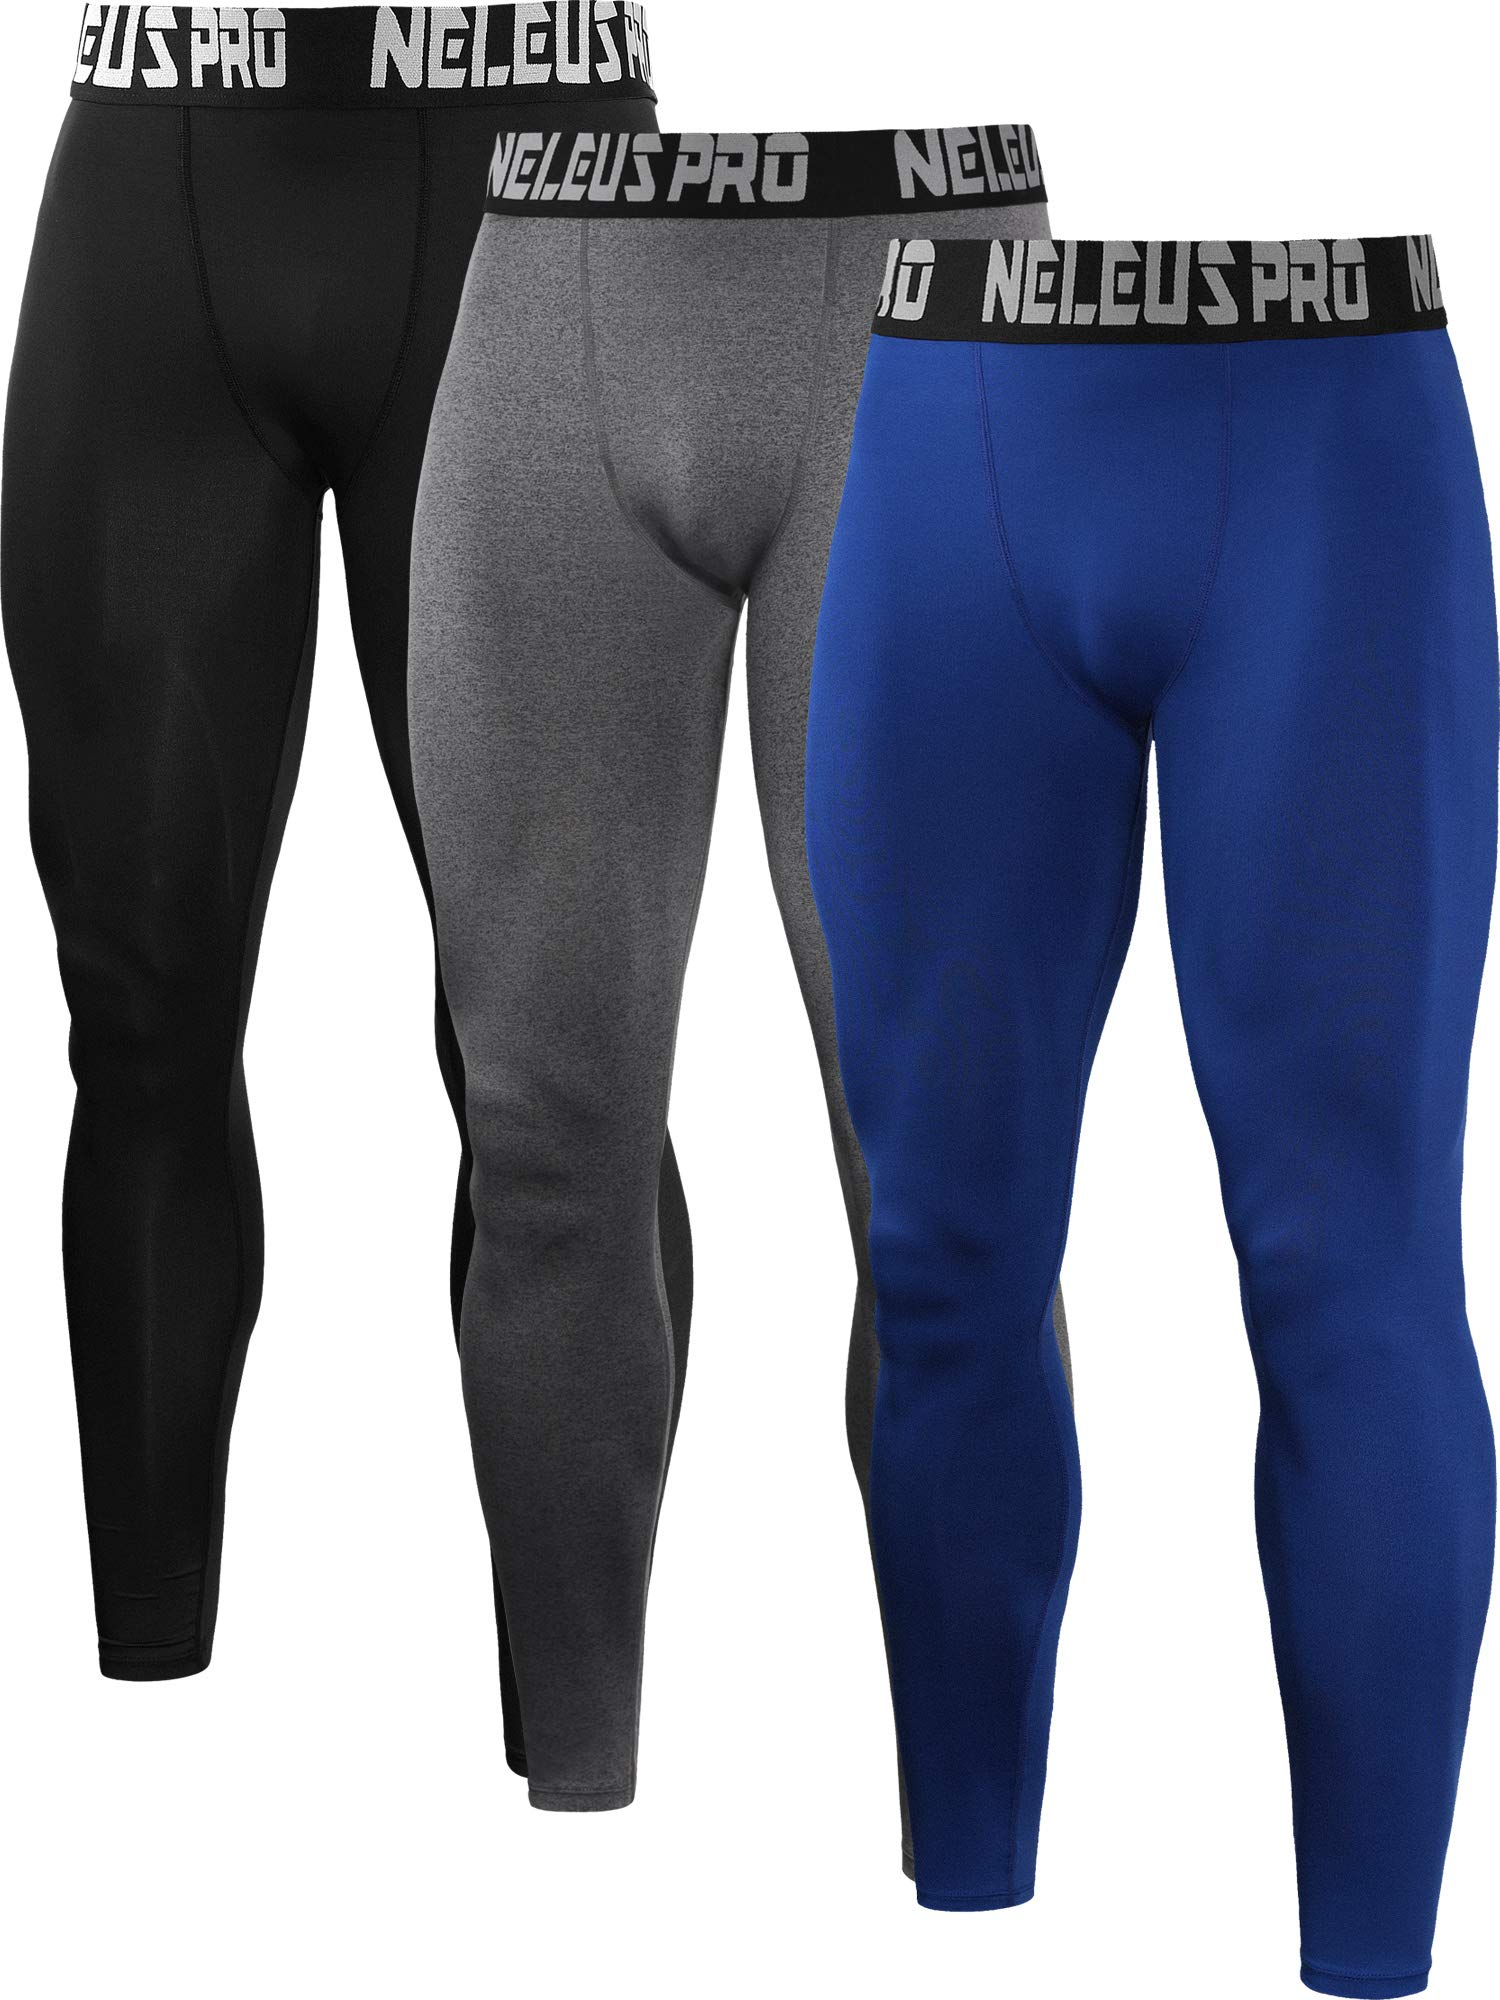 Neleus Men's 3 Pack Compression Pants Sport Running Leggings,6019,Black,Grey,Blue,S,EU M